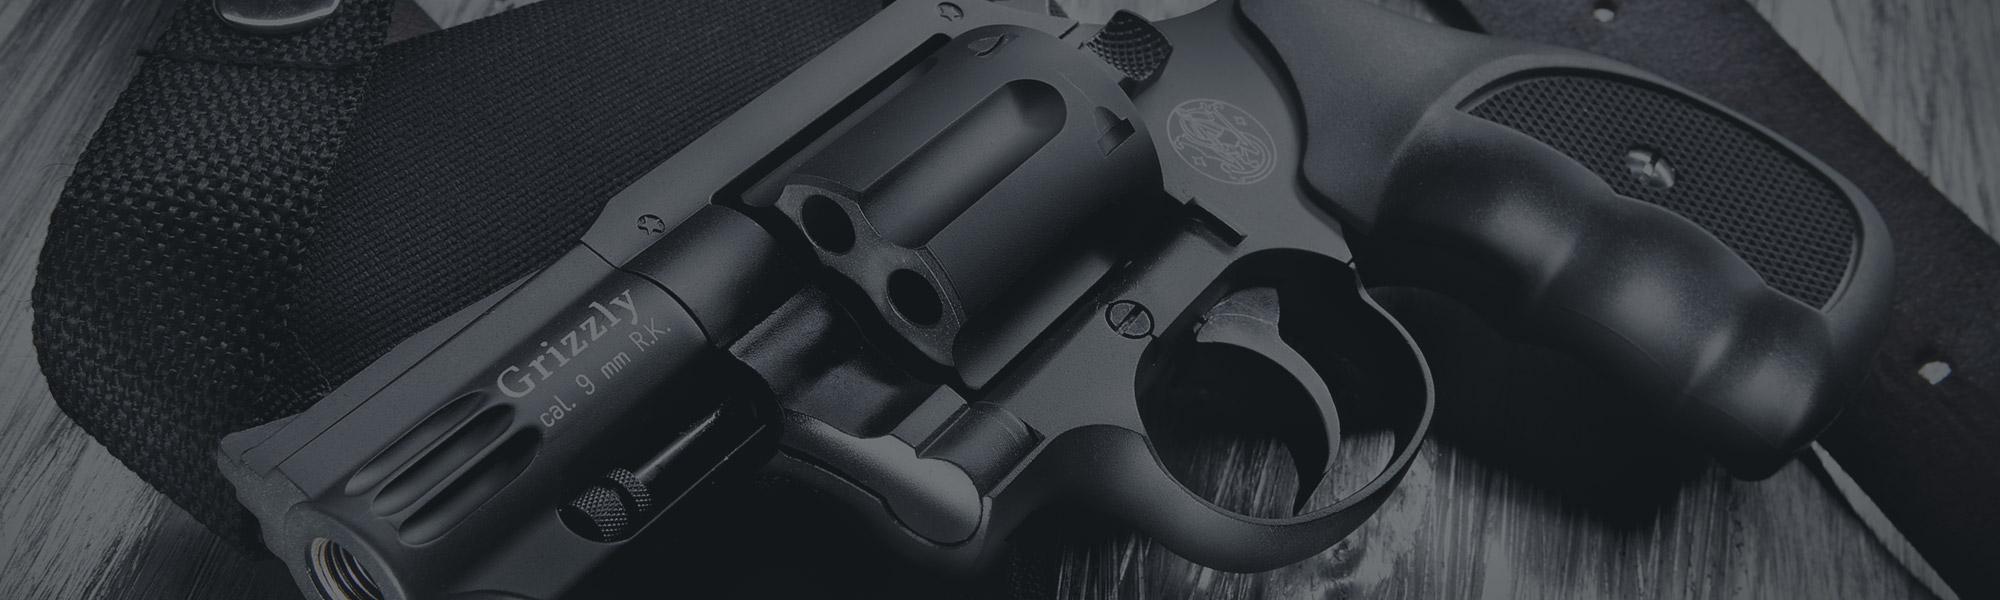 Smith & Wesson - Gas Signal Guns